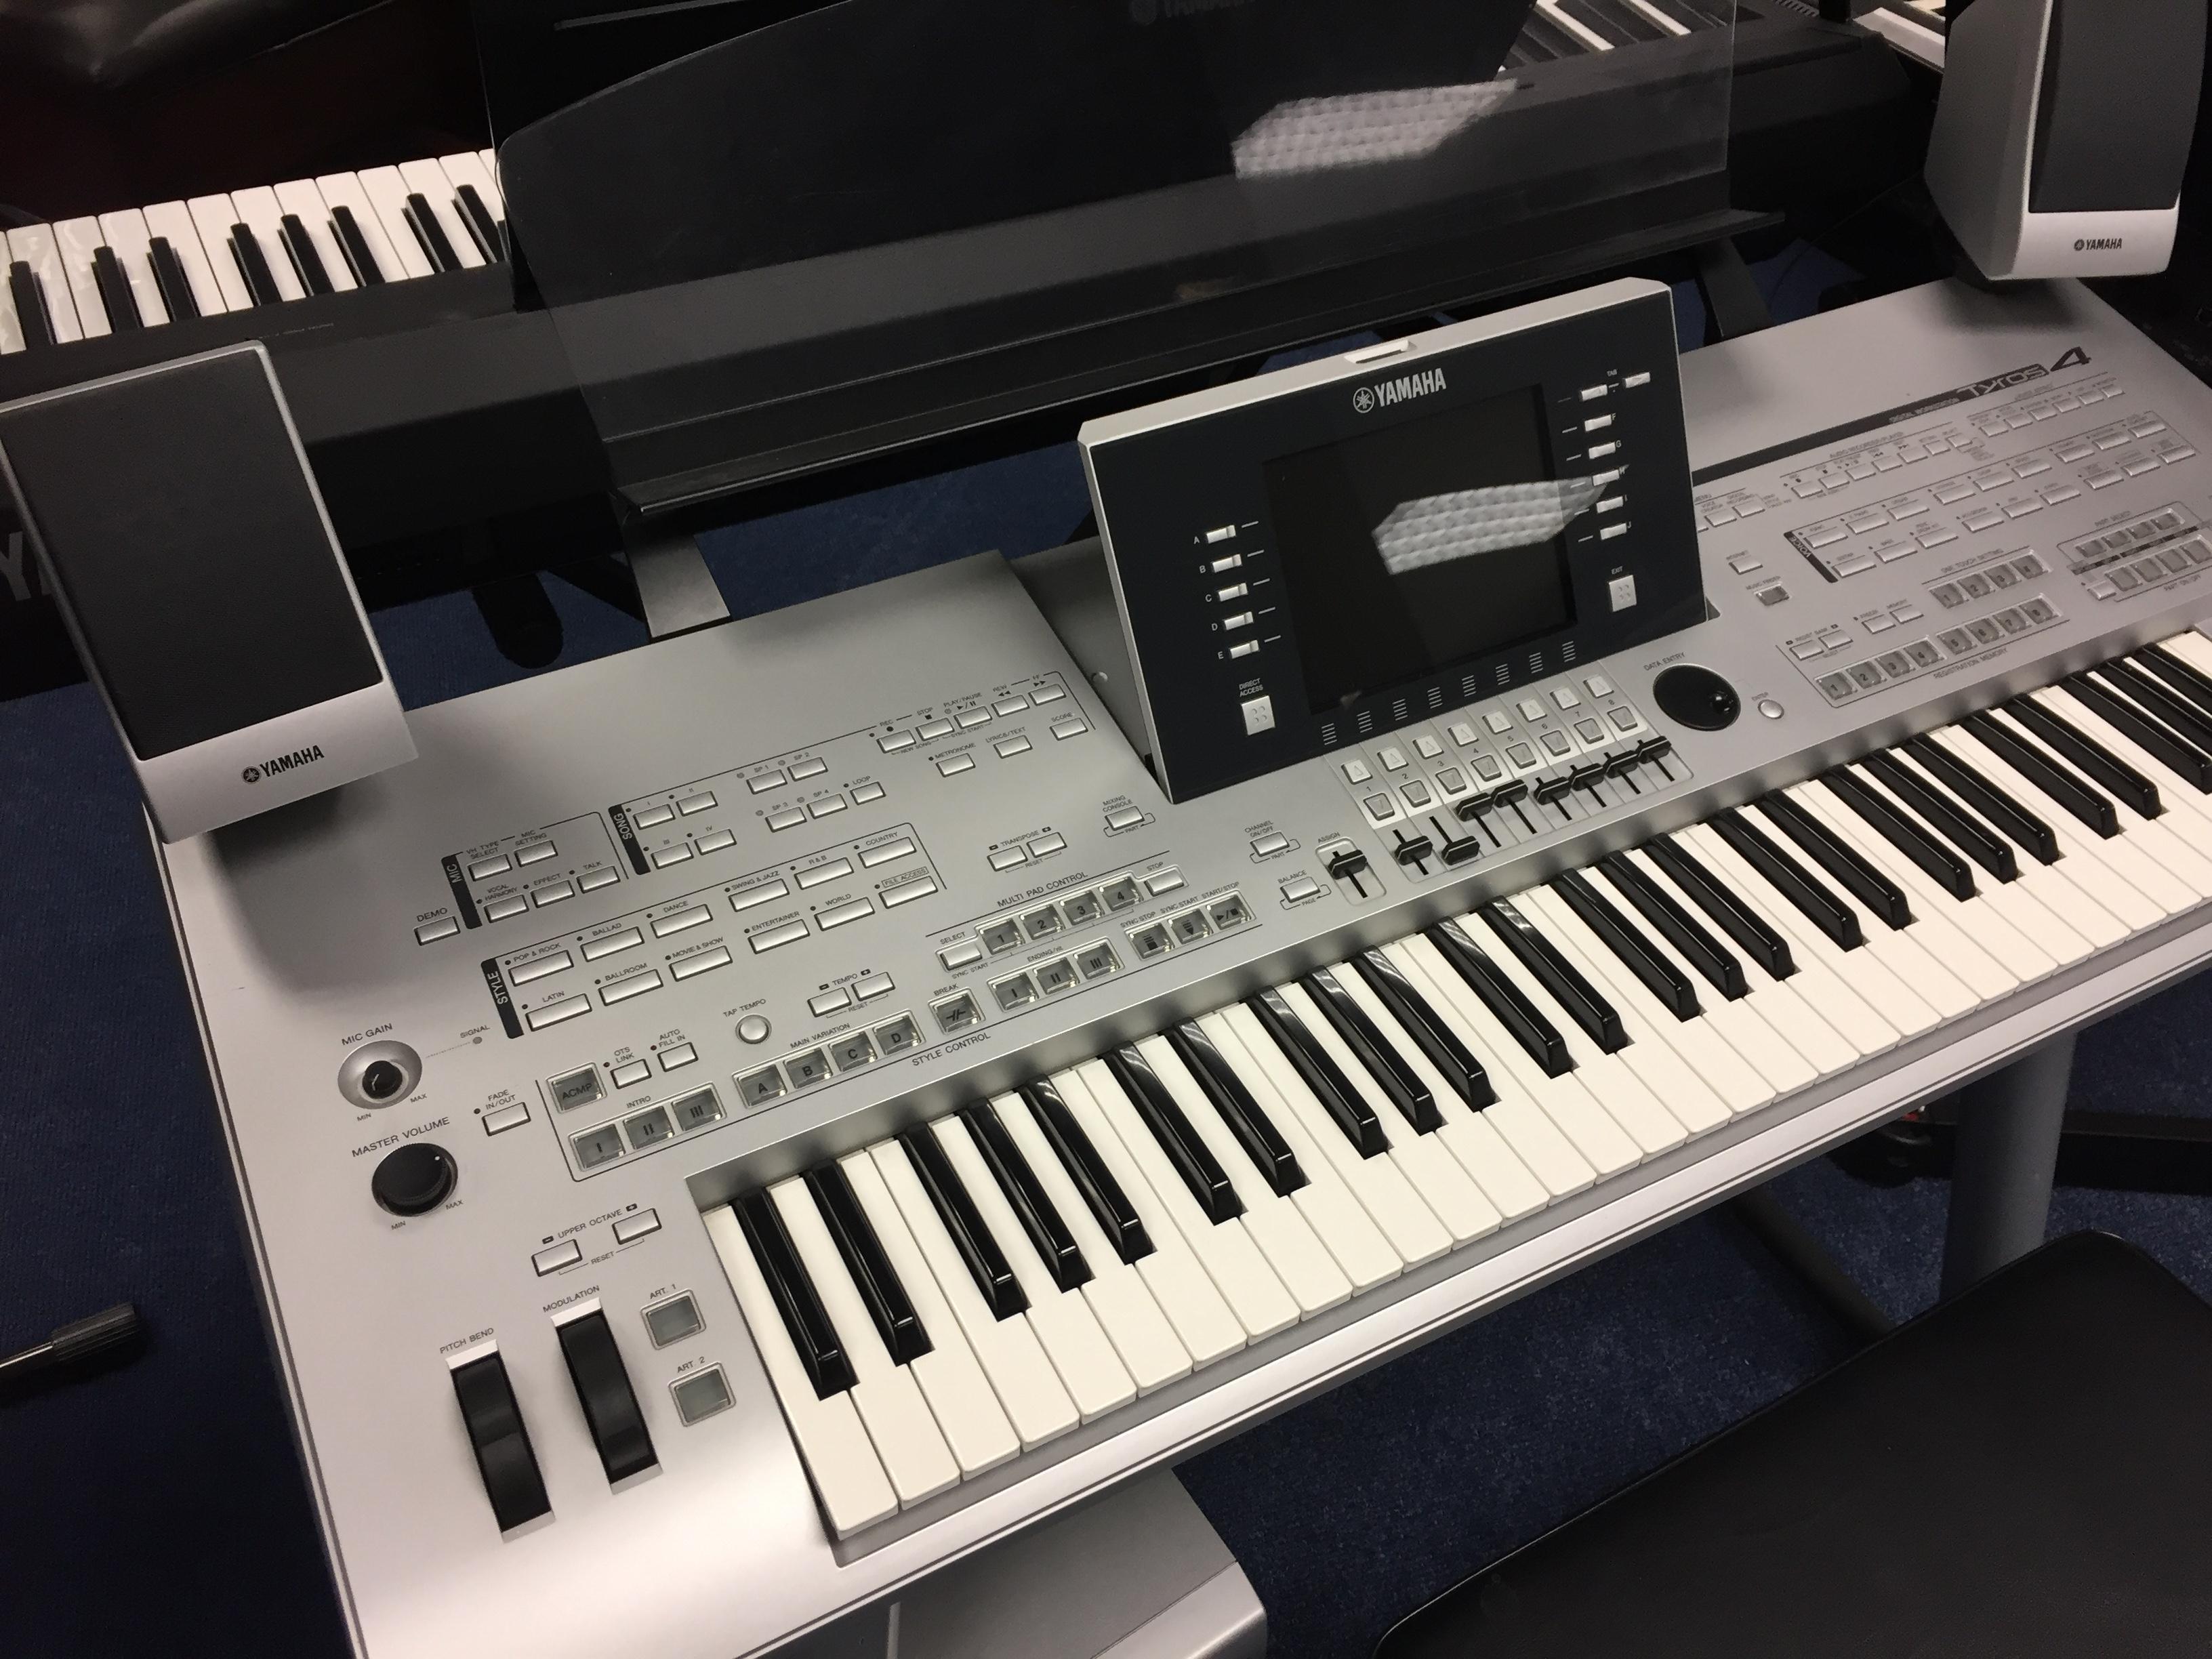 keyboards yamaha tyros 4 inc speakers. Black Bedroom Furniture Sets. Home Design Ideas